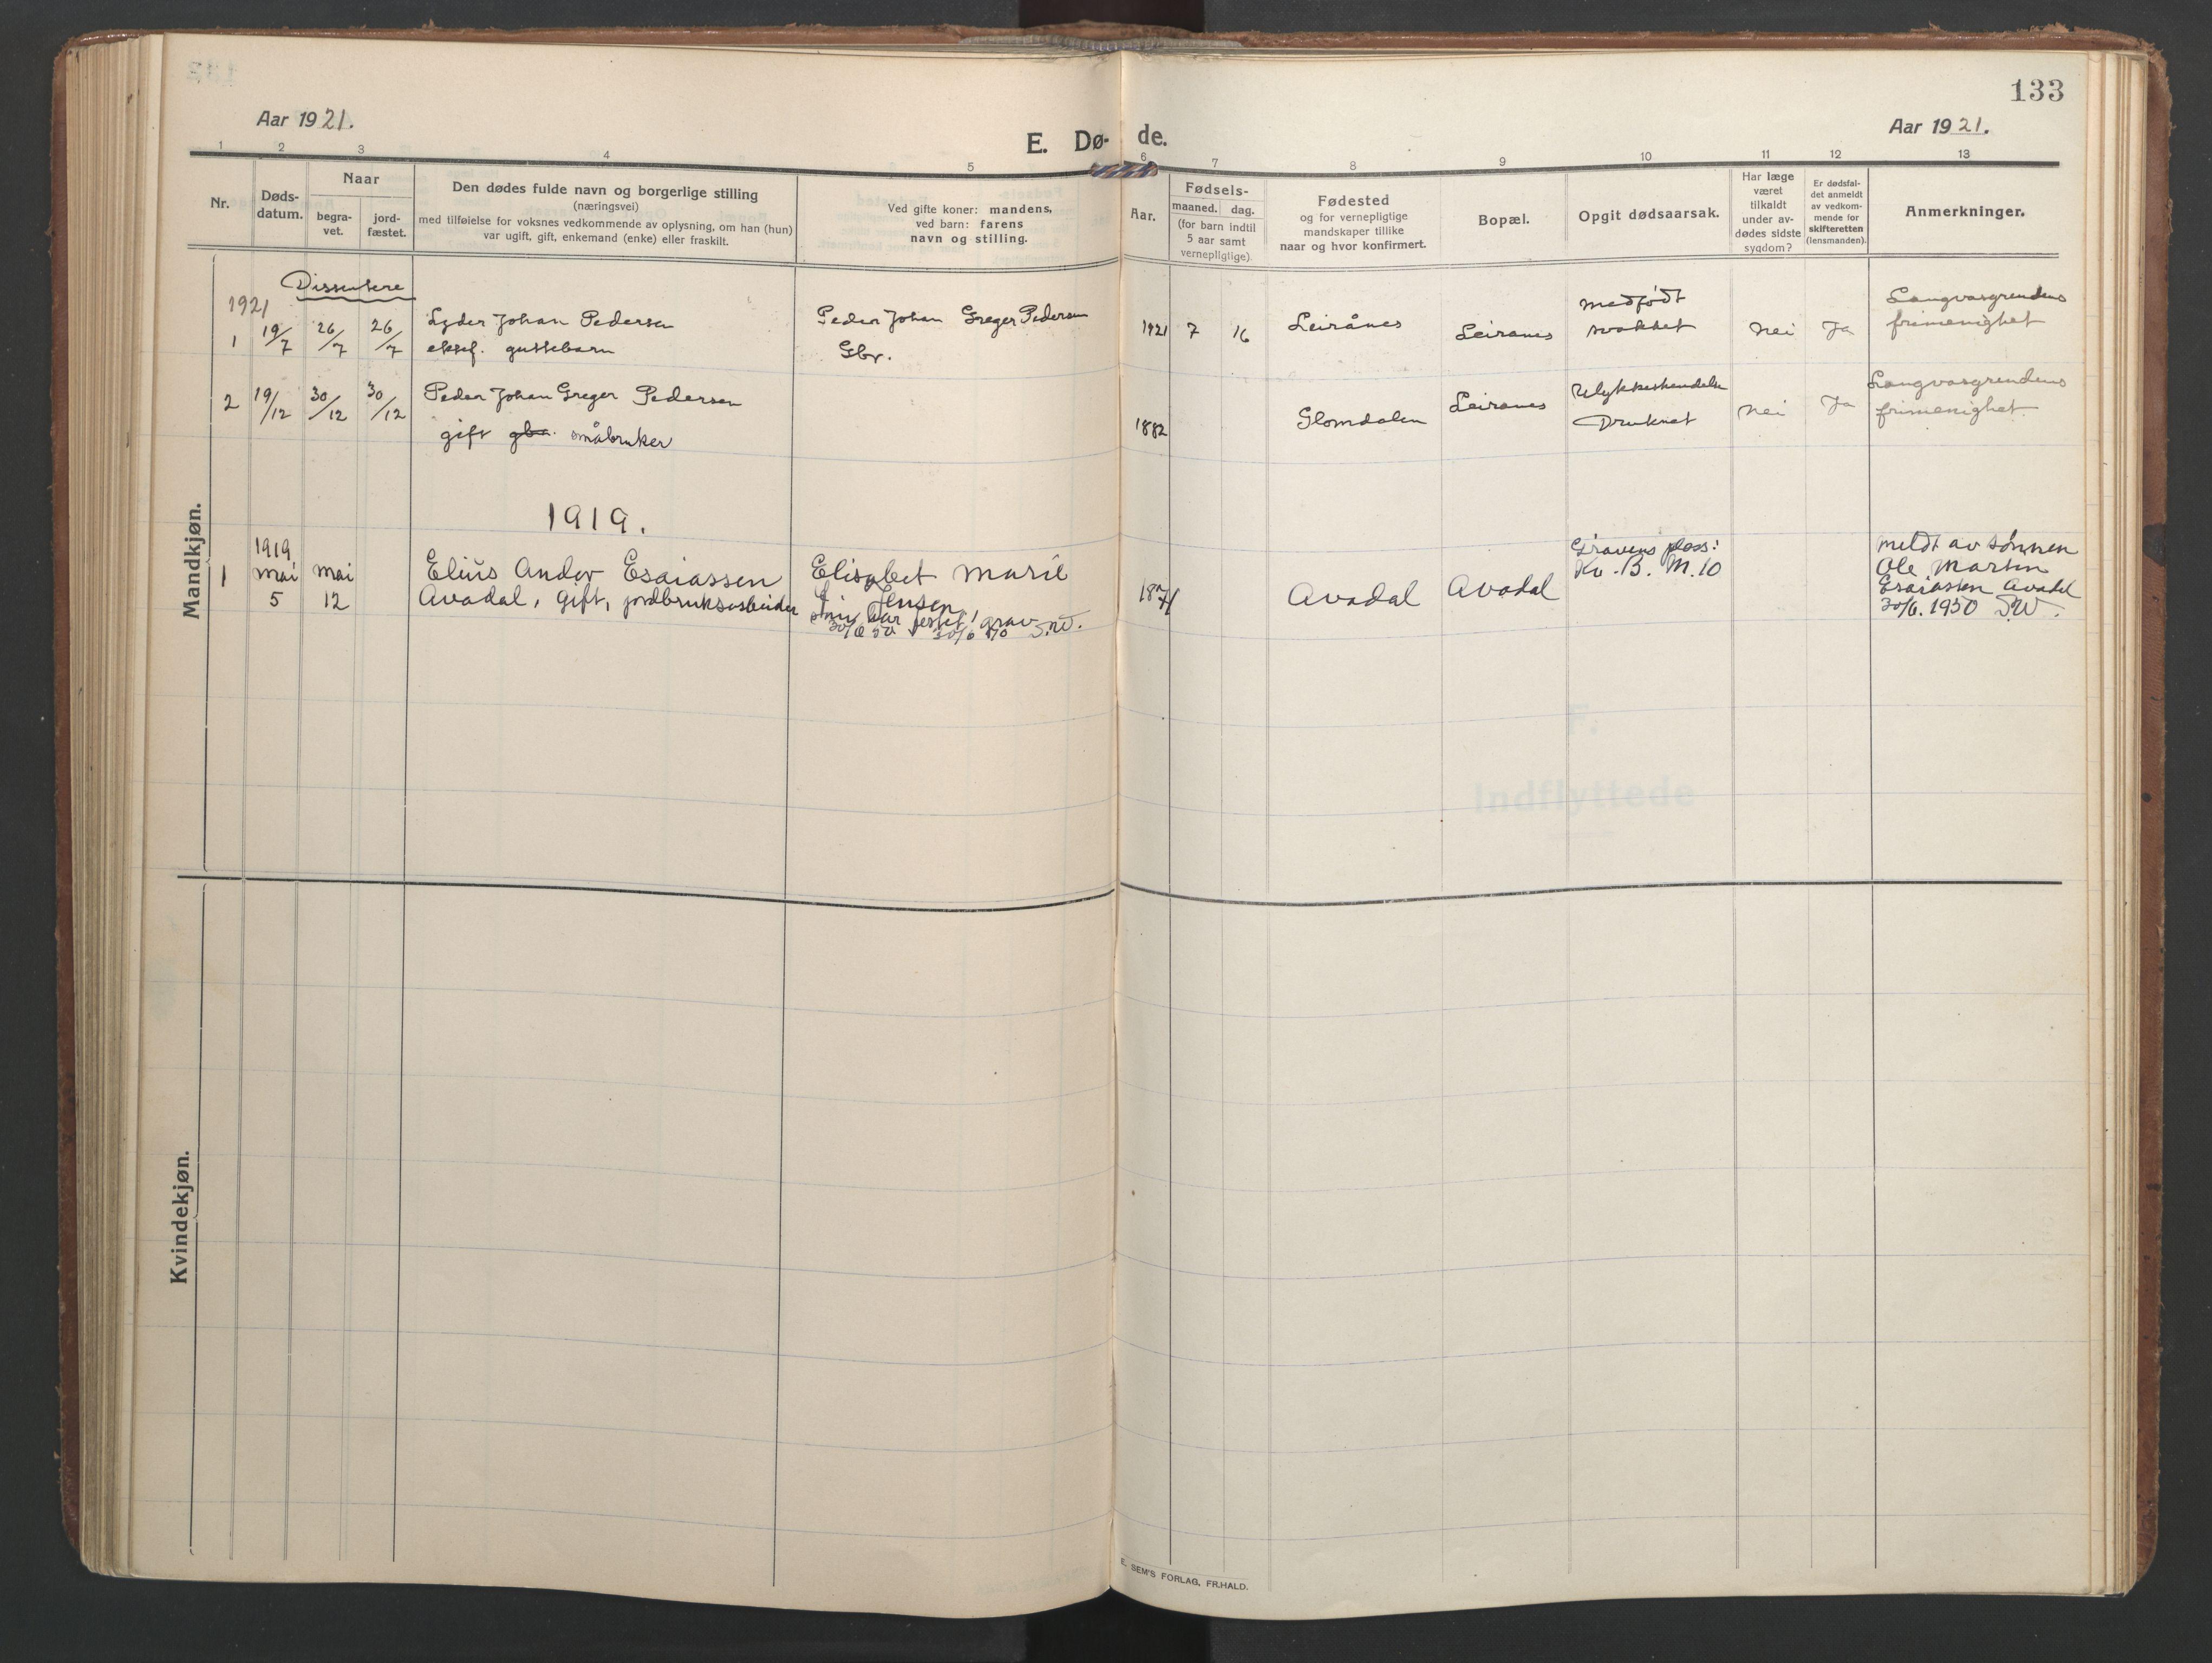 SAT, Ministerialprotokoller, klokkerbøker og fødselsregistre - Nordland, 827/L0405: Ministerialbok nr. 827A17, 1912-1925, s. 133